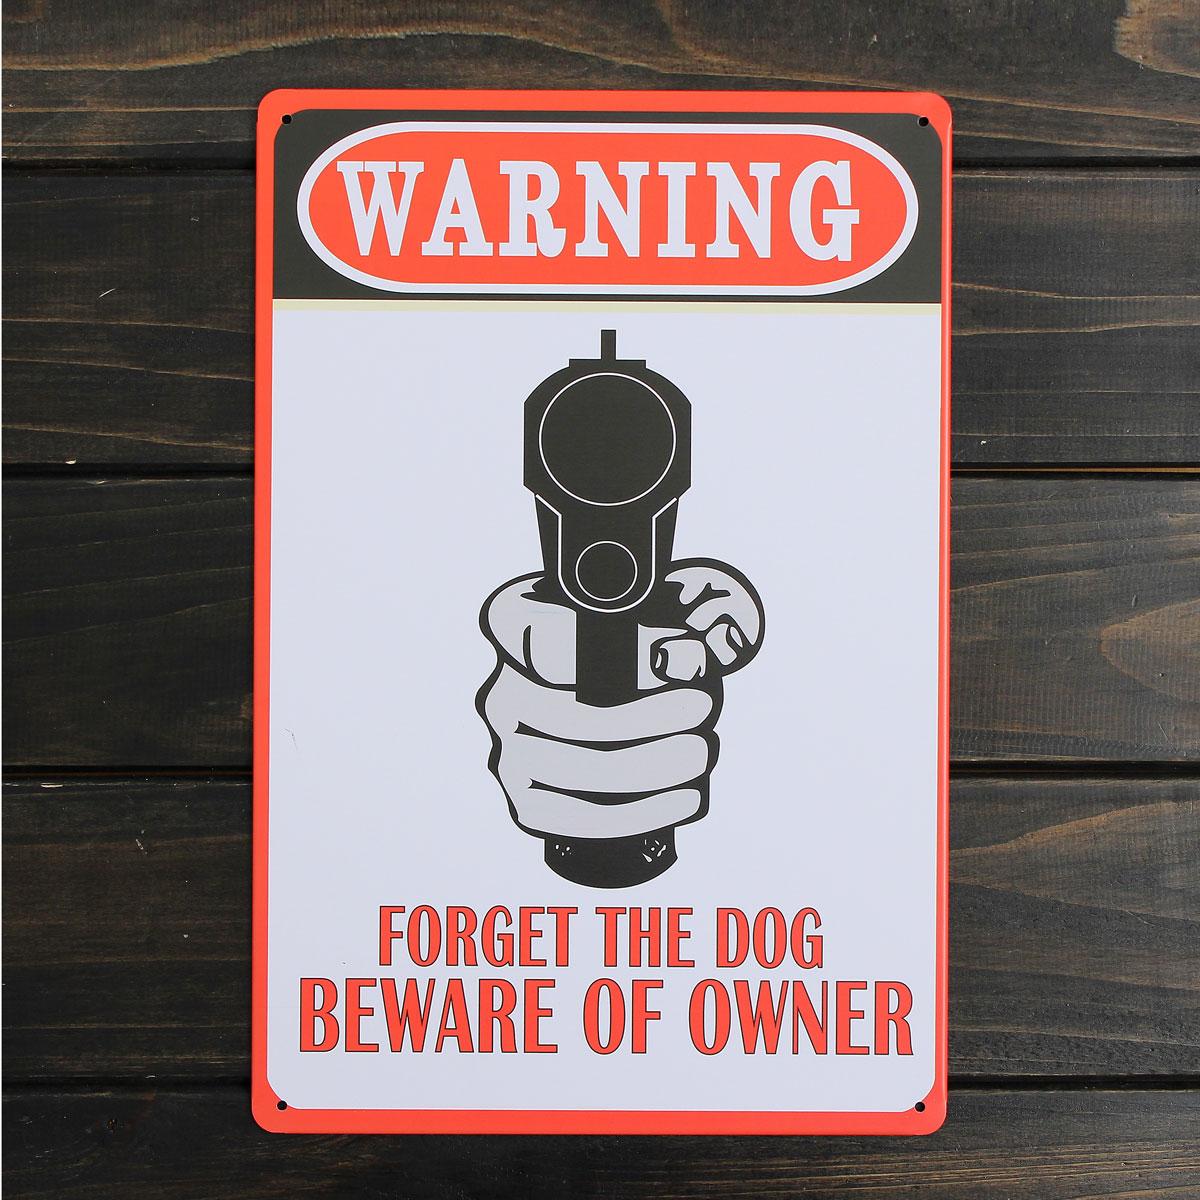 Warning Sheet Metal Drawing Metal Painting Tin Shop Pub Wall Tavern Poster Sign